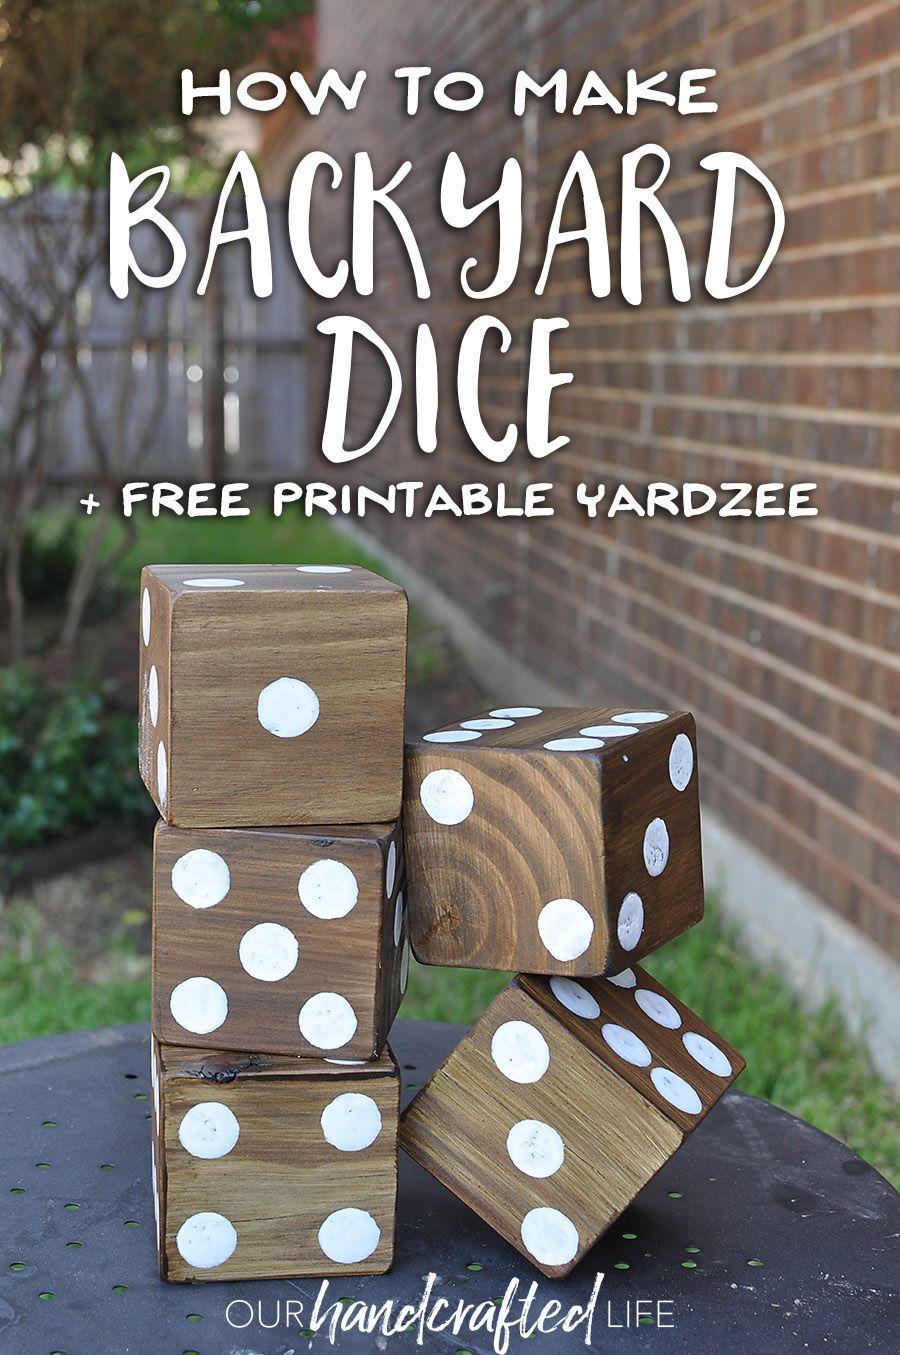 How to Make Giant Yard Dice + Free Printable Yardzee